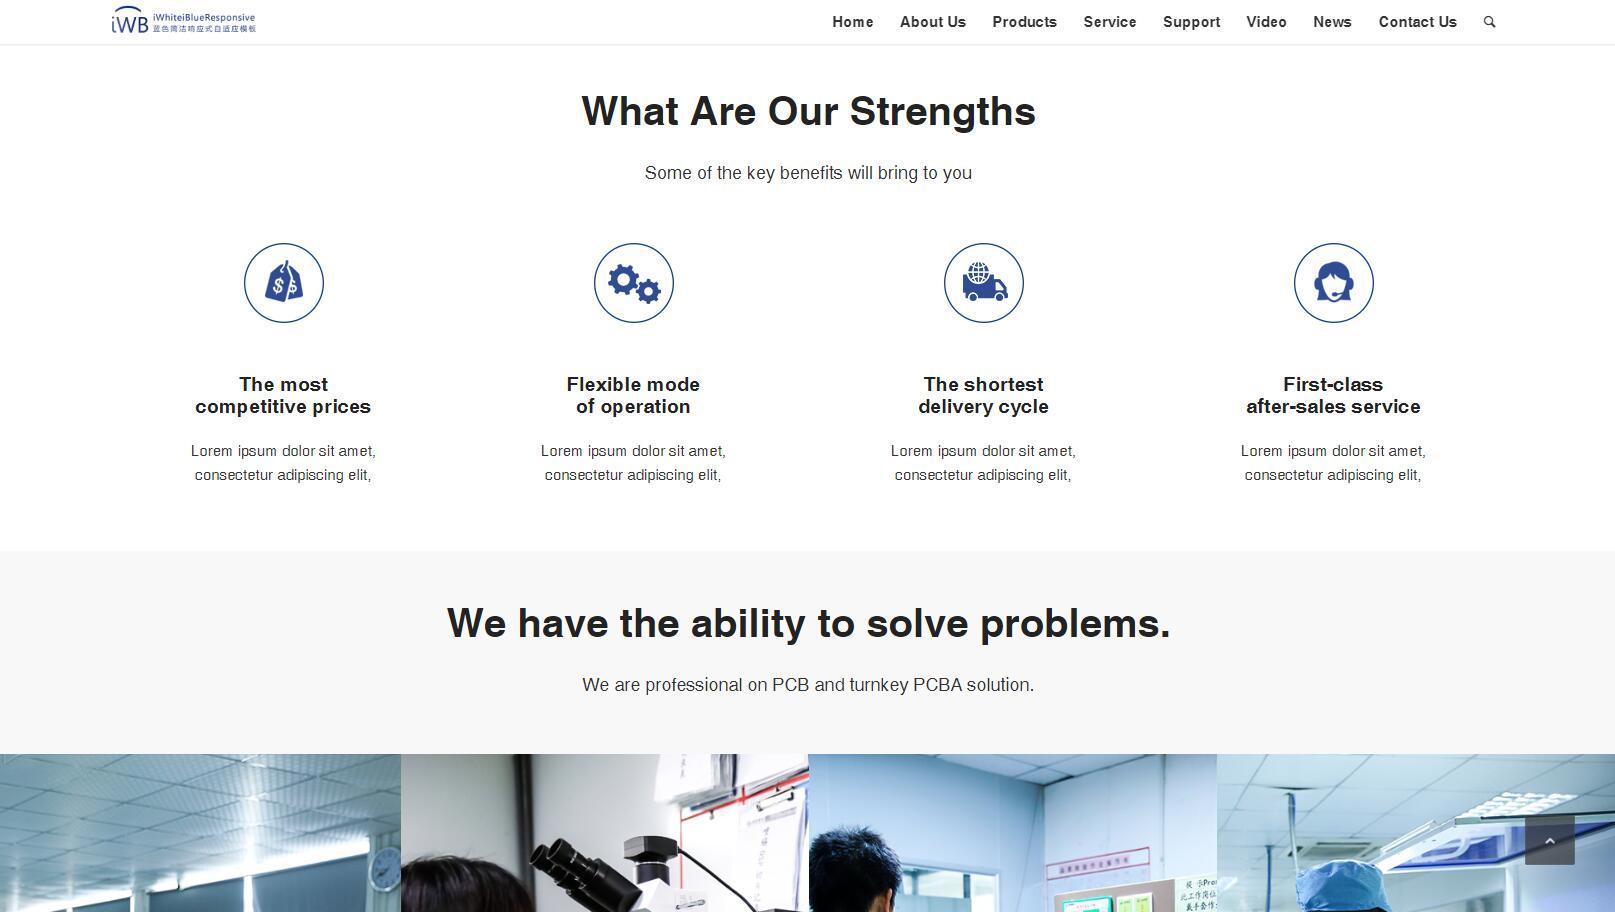 iWhiteiBlueResponsive蓝色响应式自适应Phpcms企业网站模板